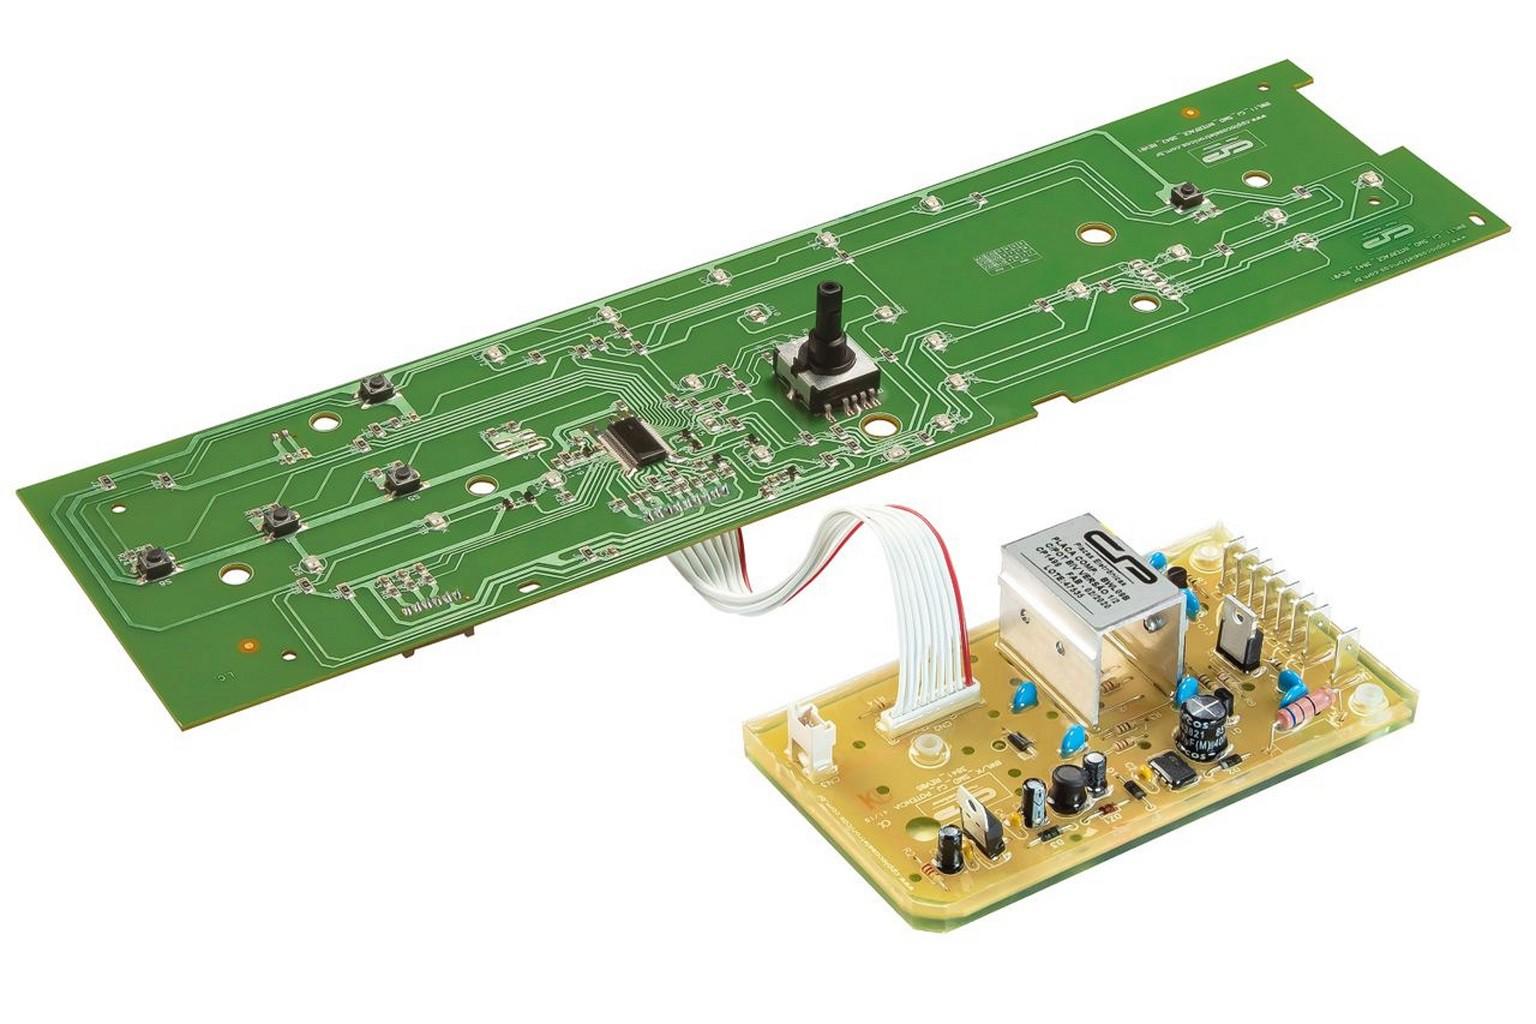 Placa compatível Lavadora Brastemp BWL09B com potência - Bivolt - Versão 1/2 - CP 1499